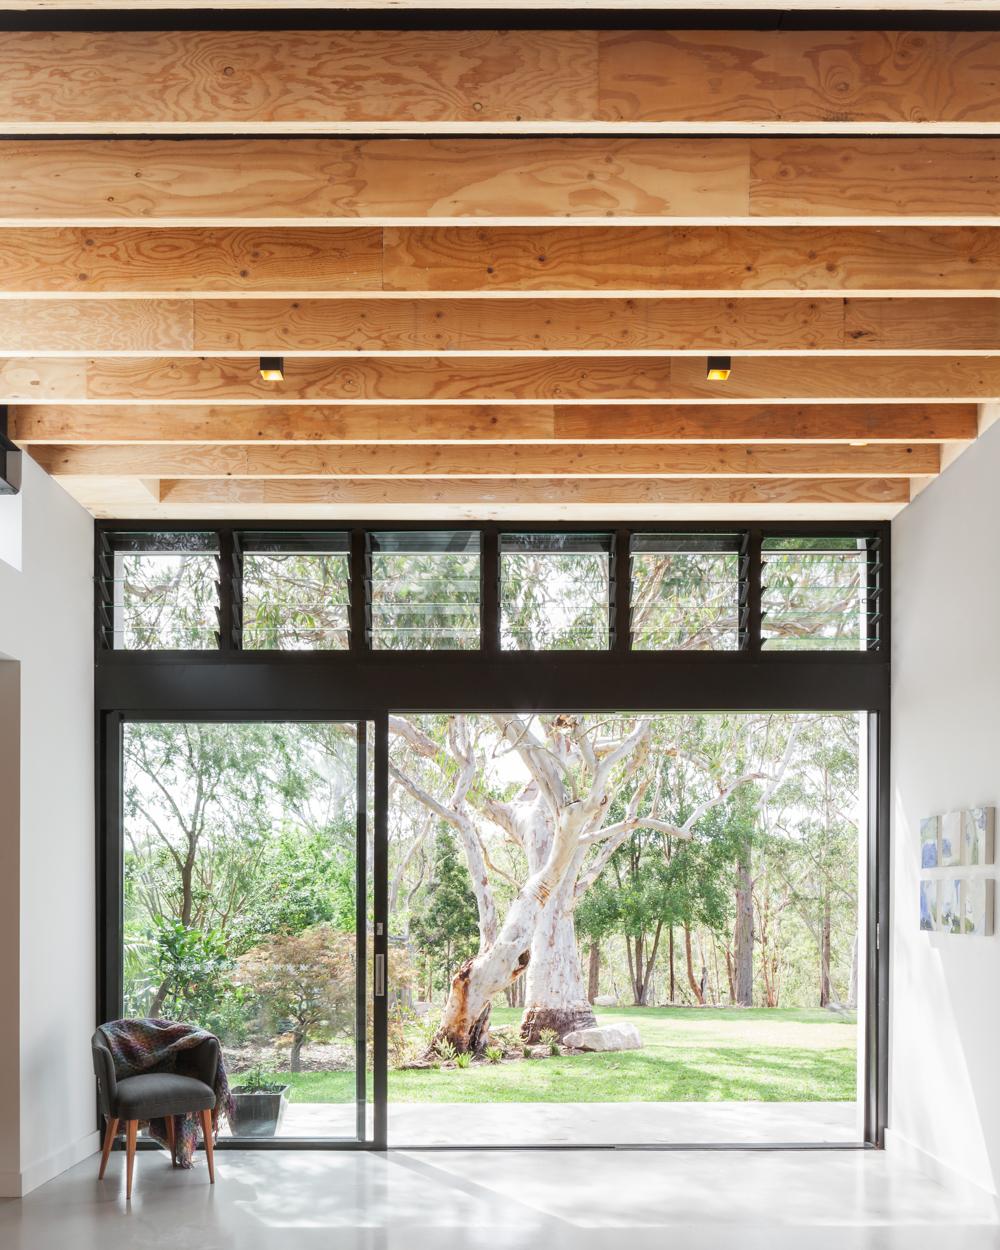 turramurra-house=noxon-giffen-architects-the-design-emotive--10.jpg